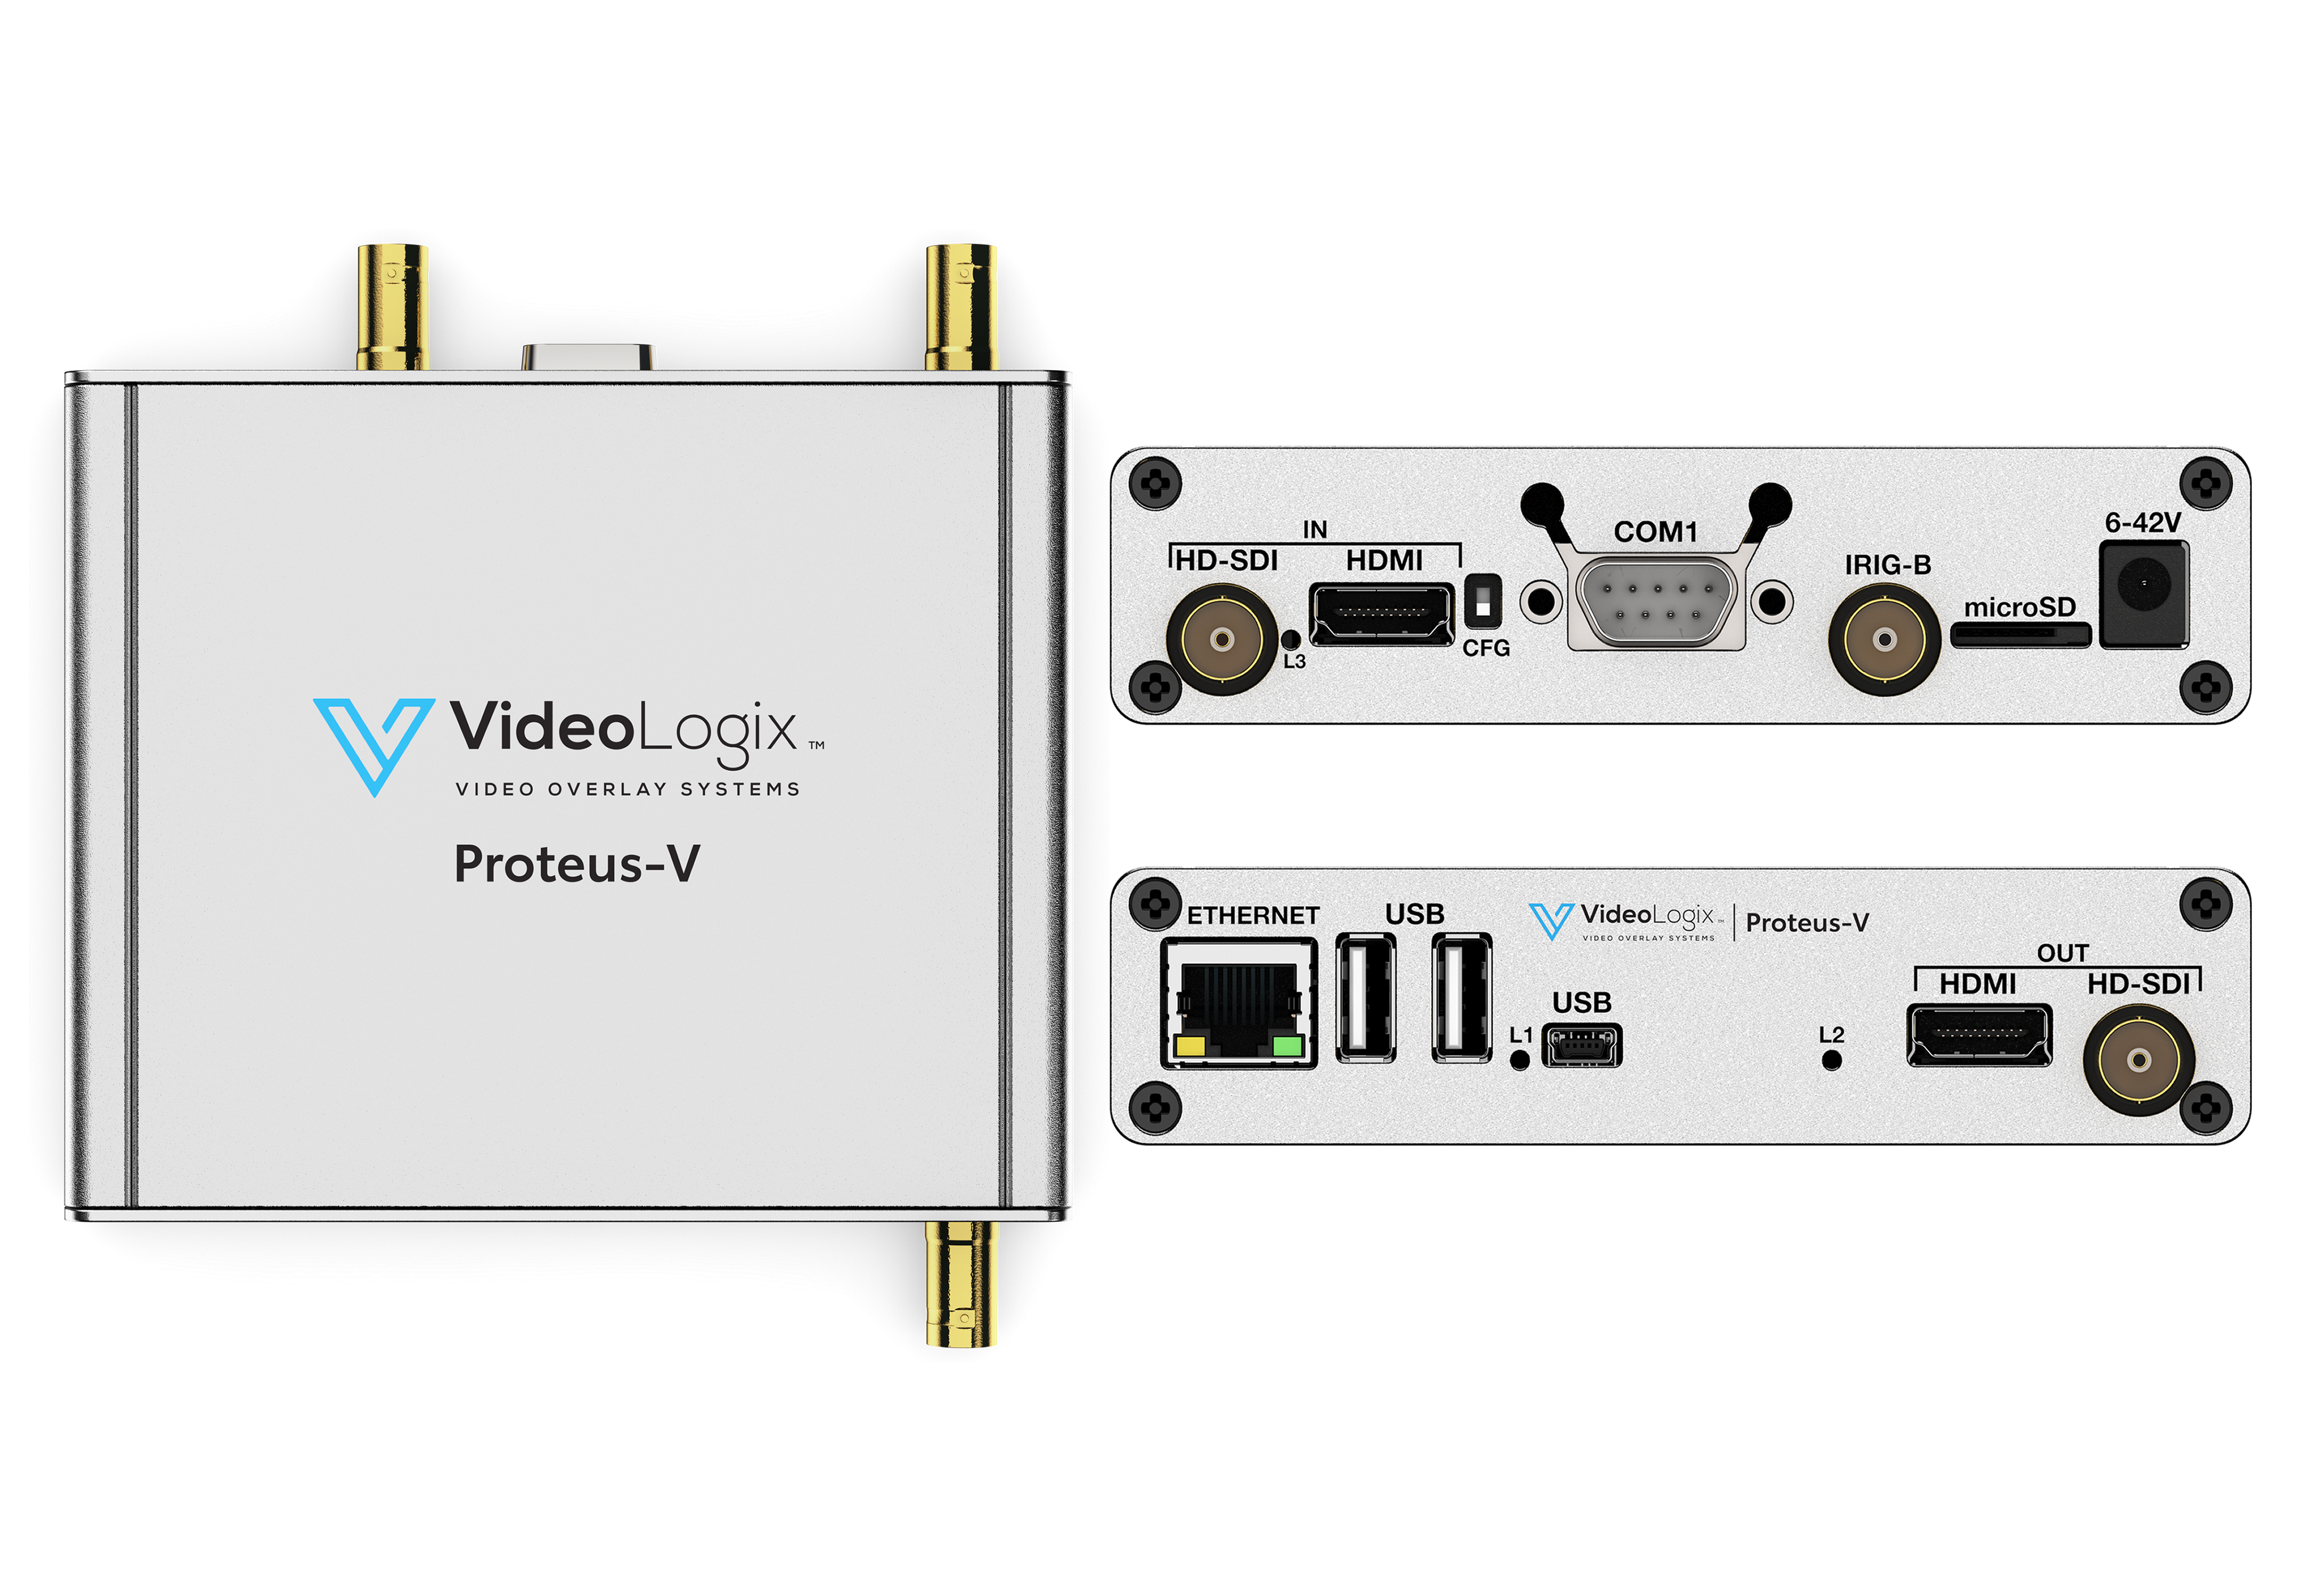 HD Video Overlay Device, HD-SDI, HDMI OSD | Proteus